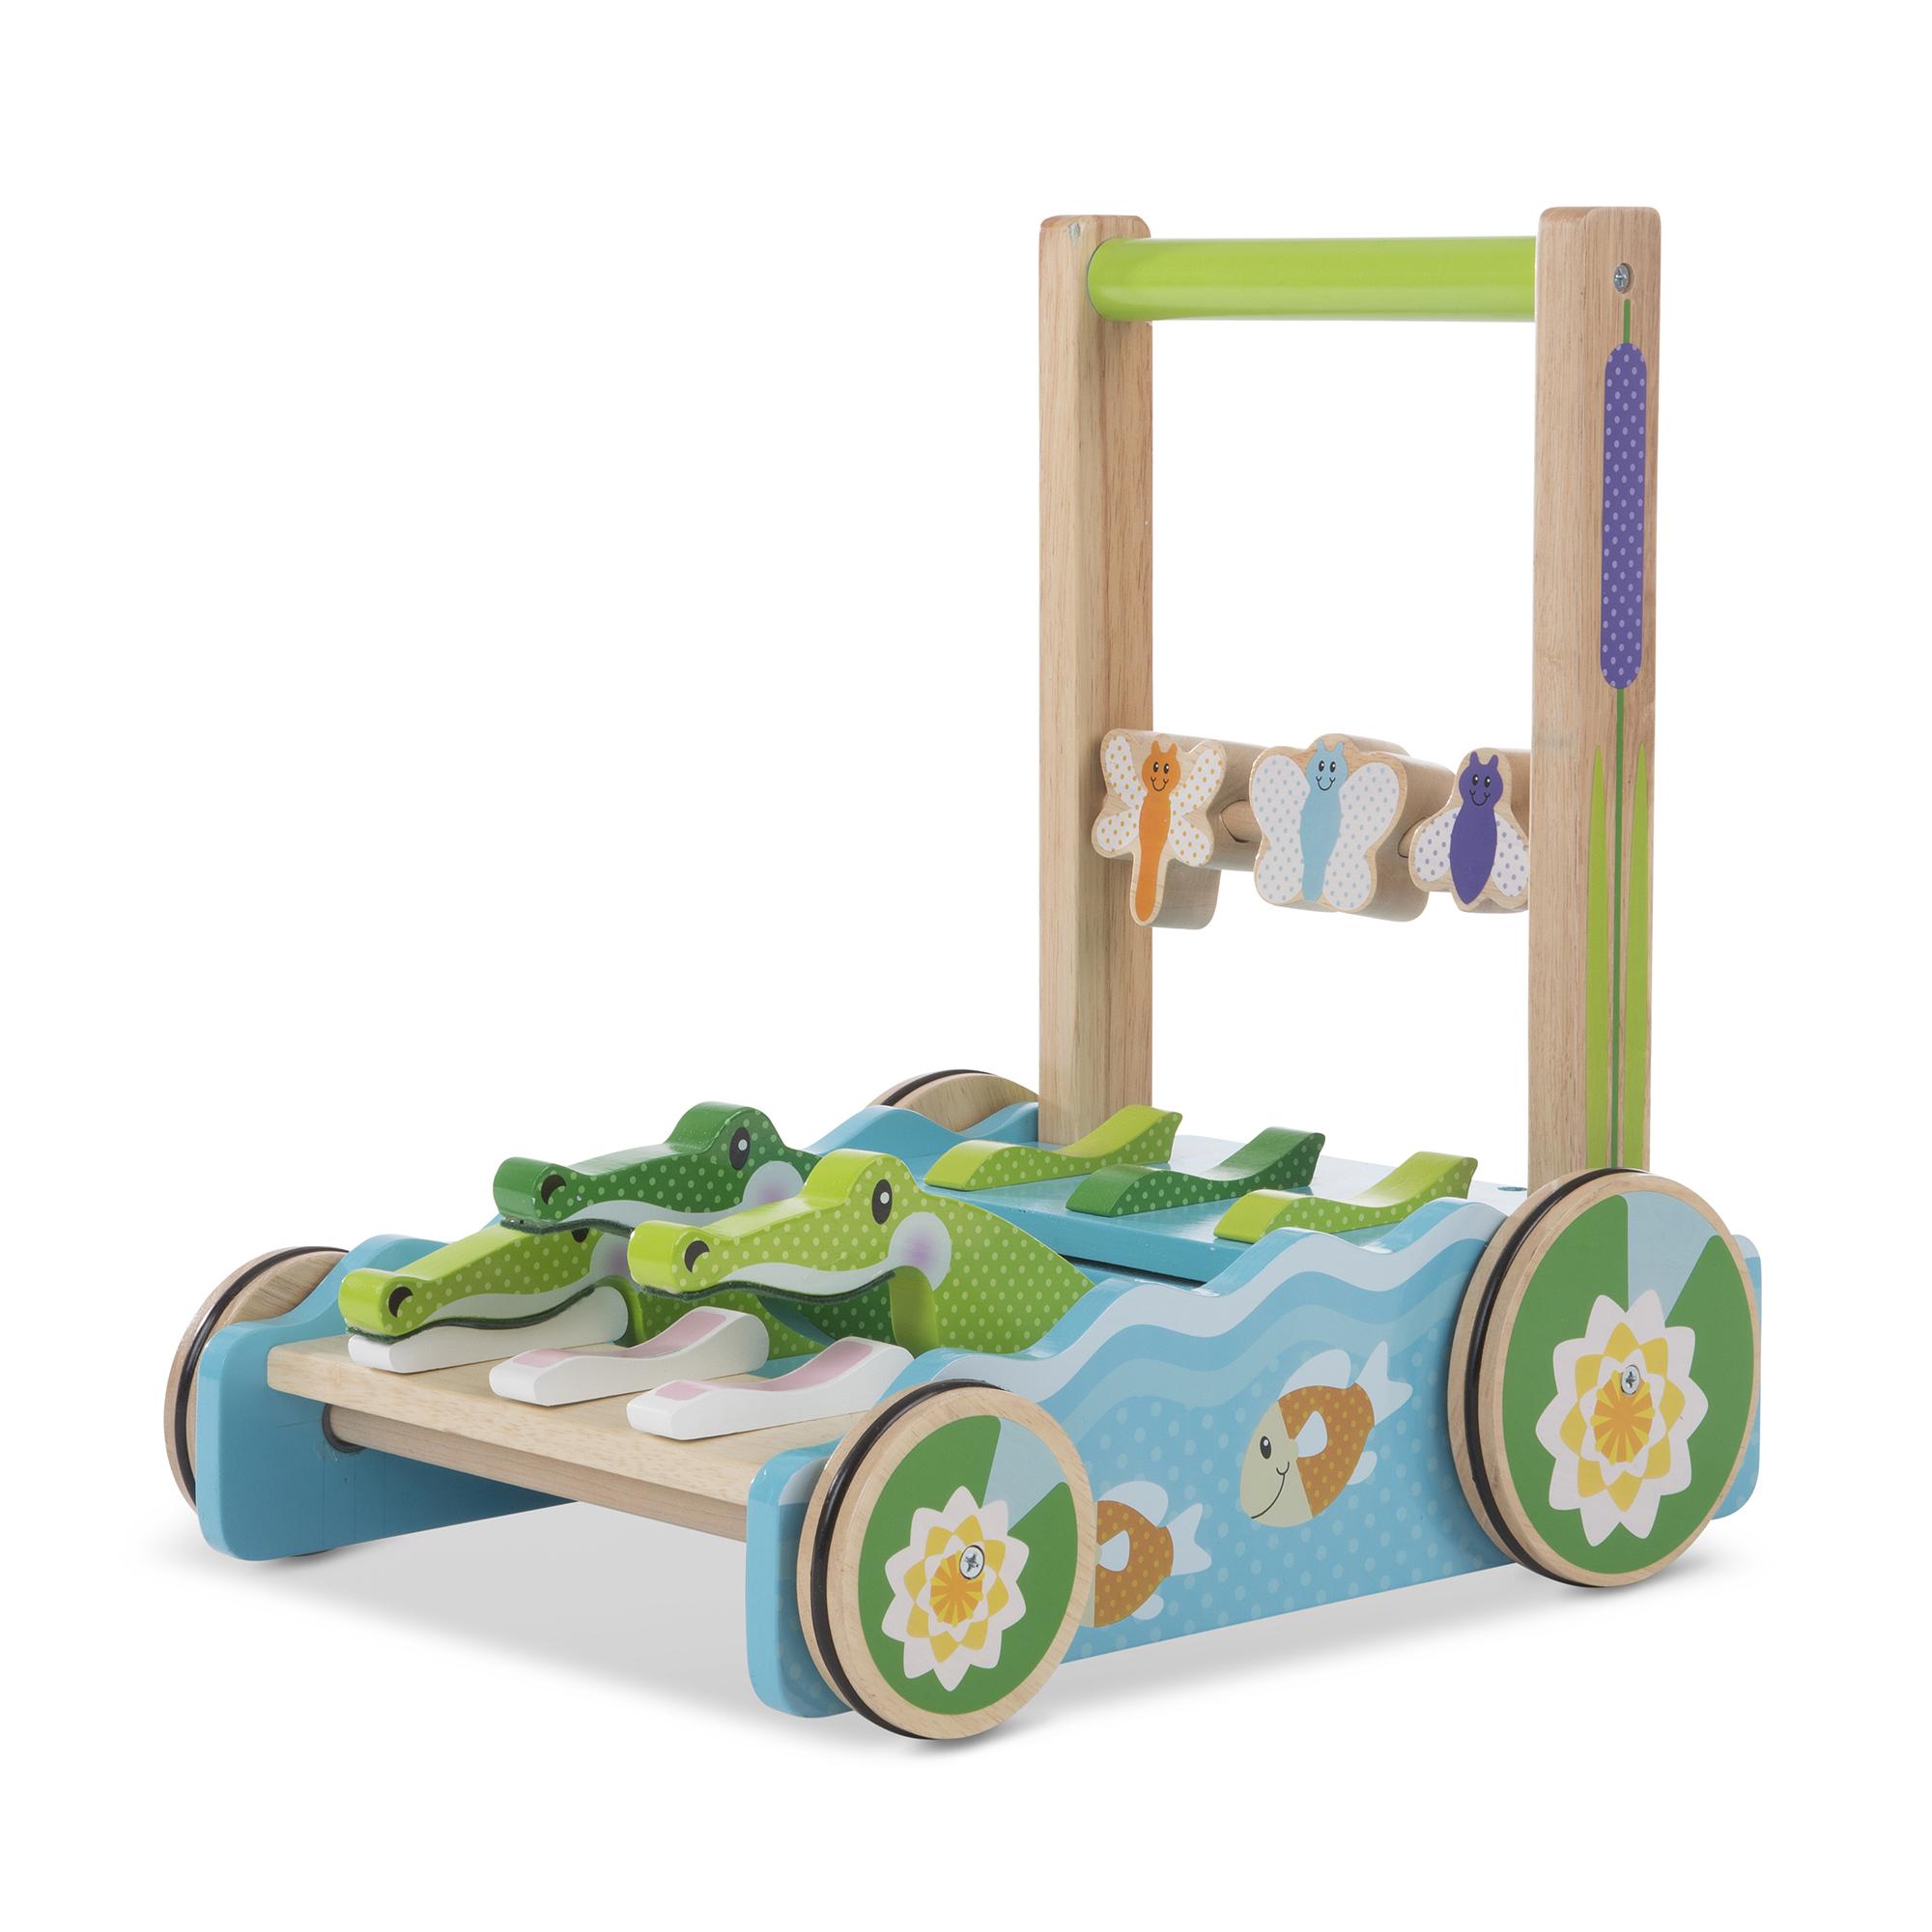 Melissa & Doug - First Play - Chomp & Clack Alligator Push Toy (13129)